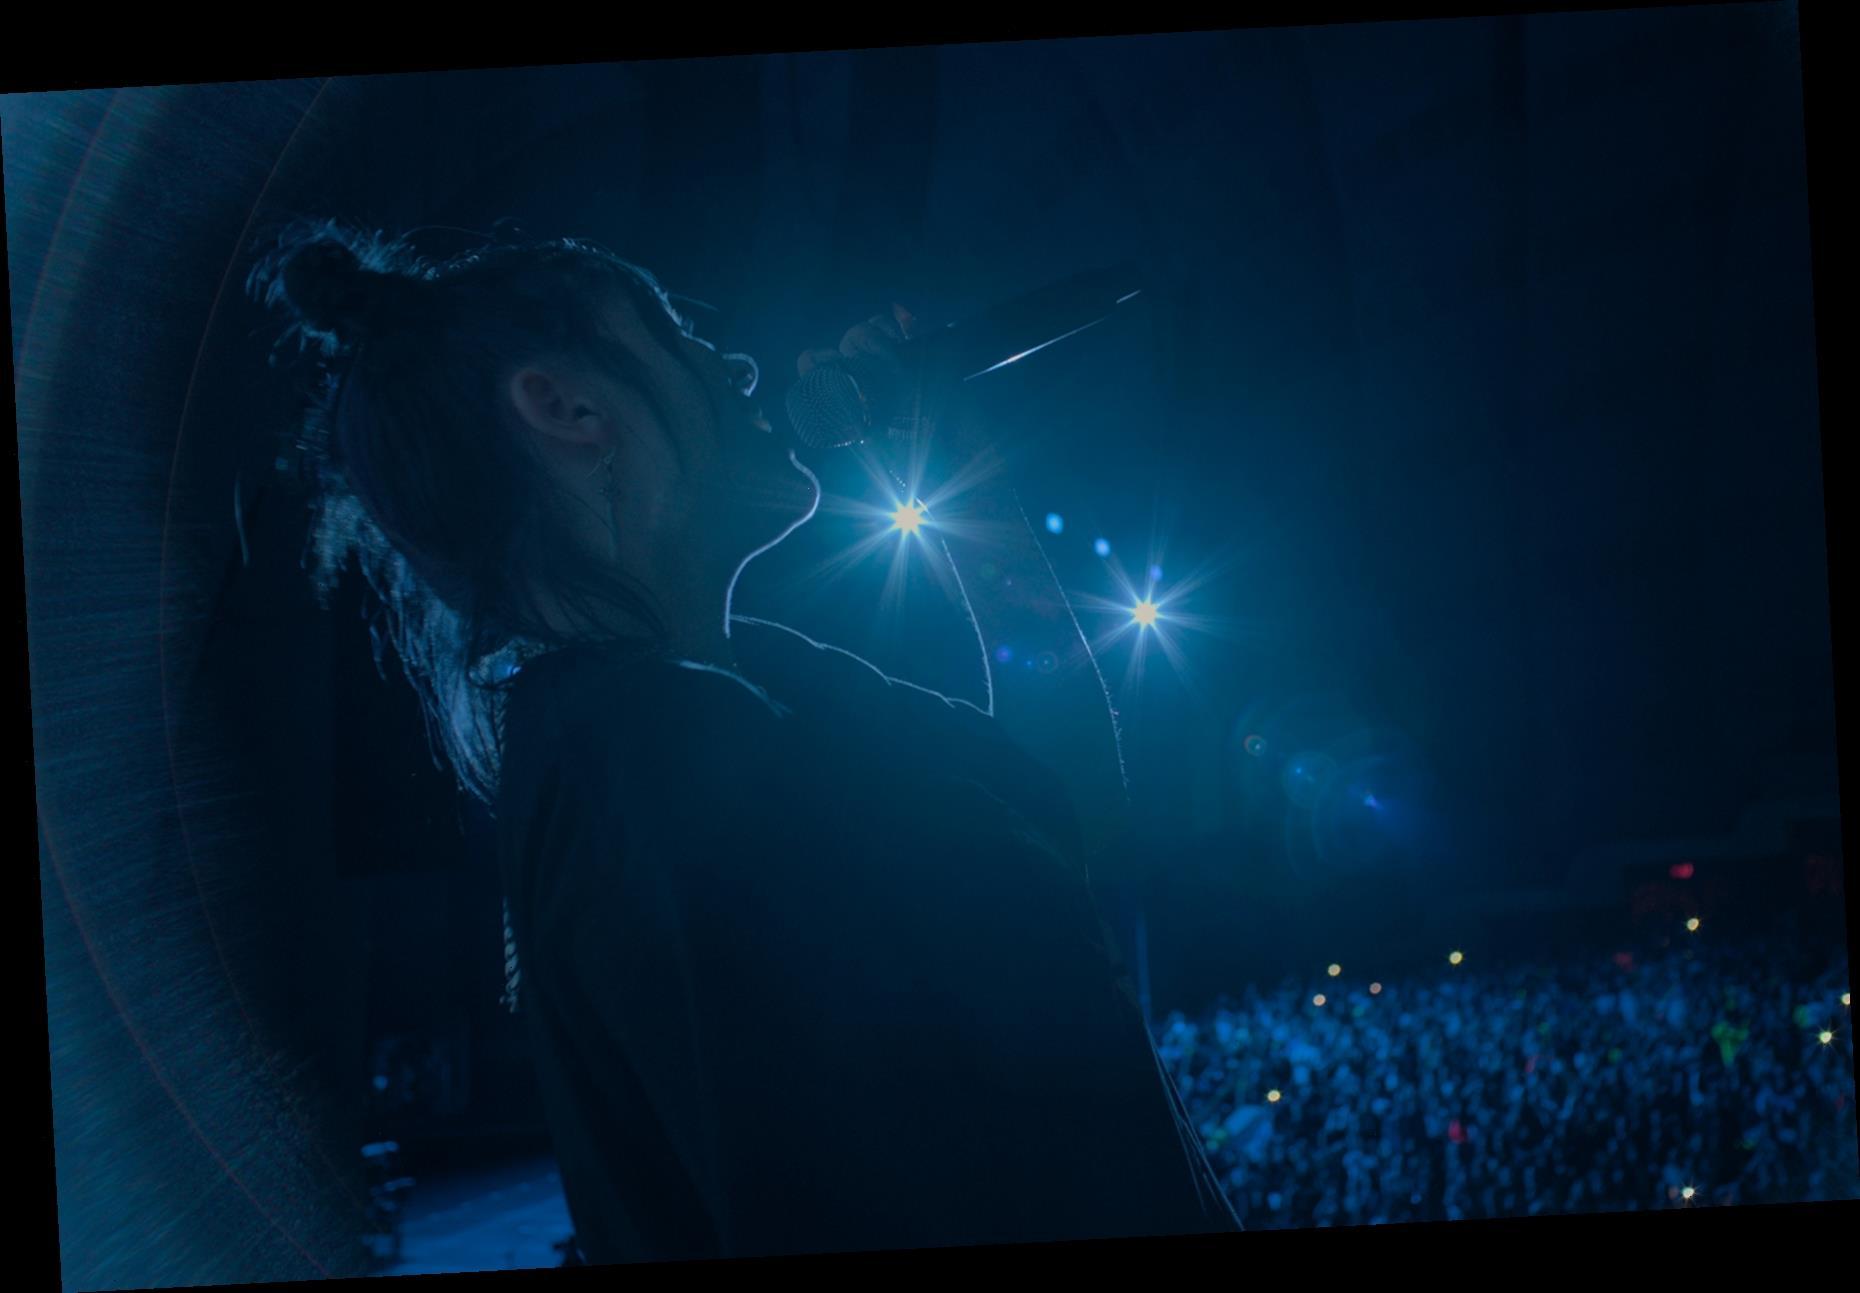 Billie Eilish to Host 'The World's a Little Blurry' Livestream Event